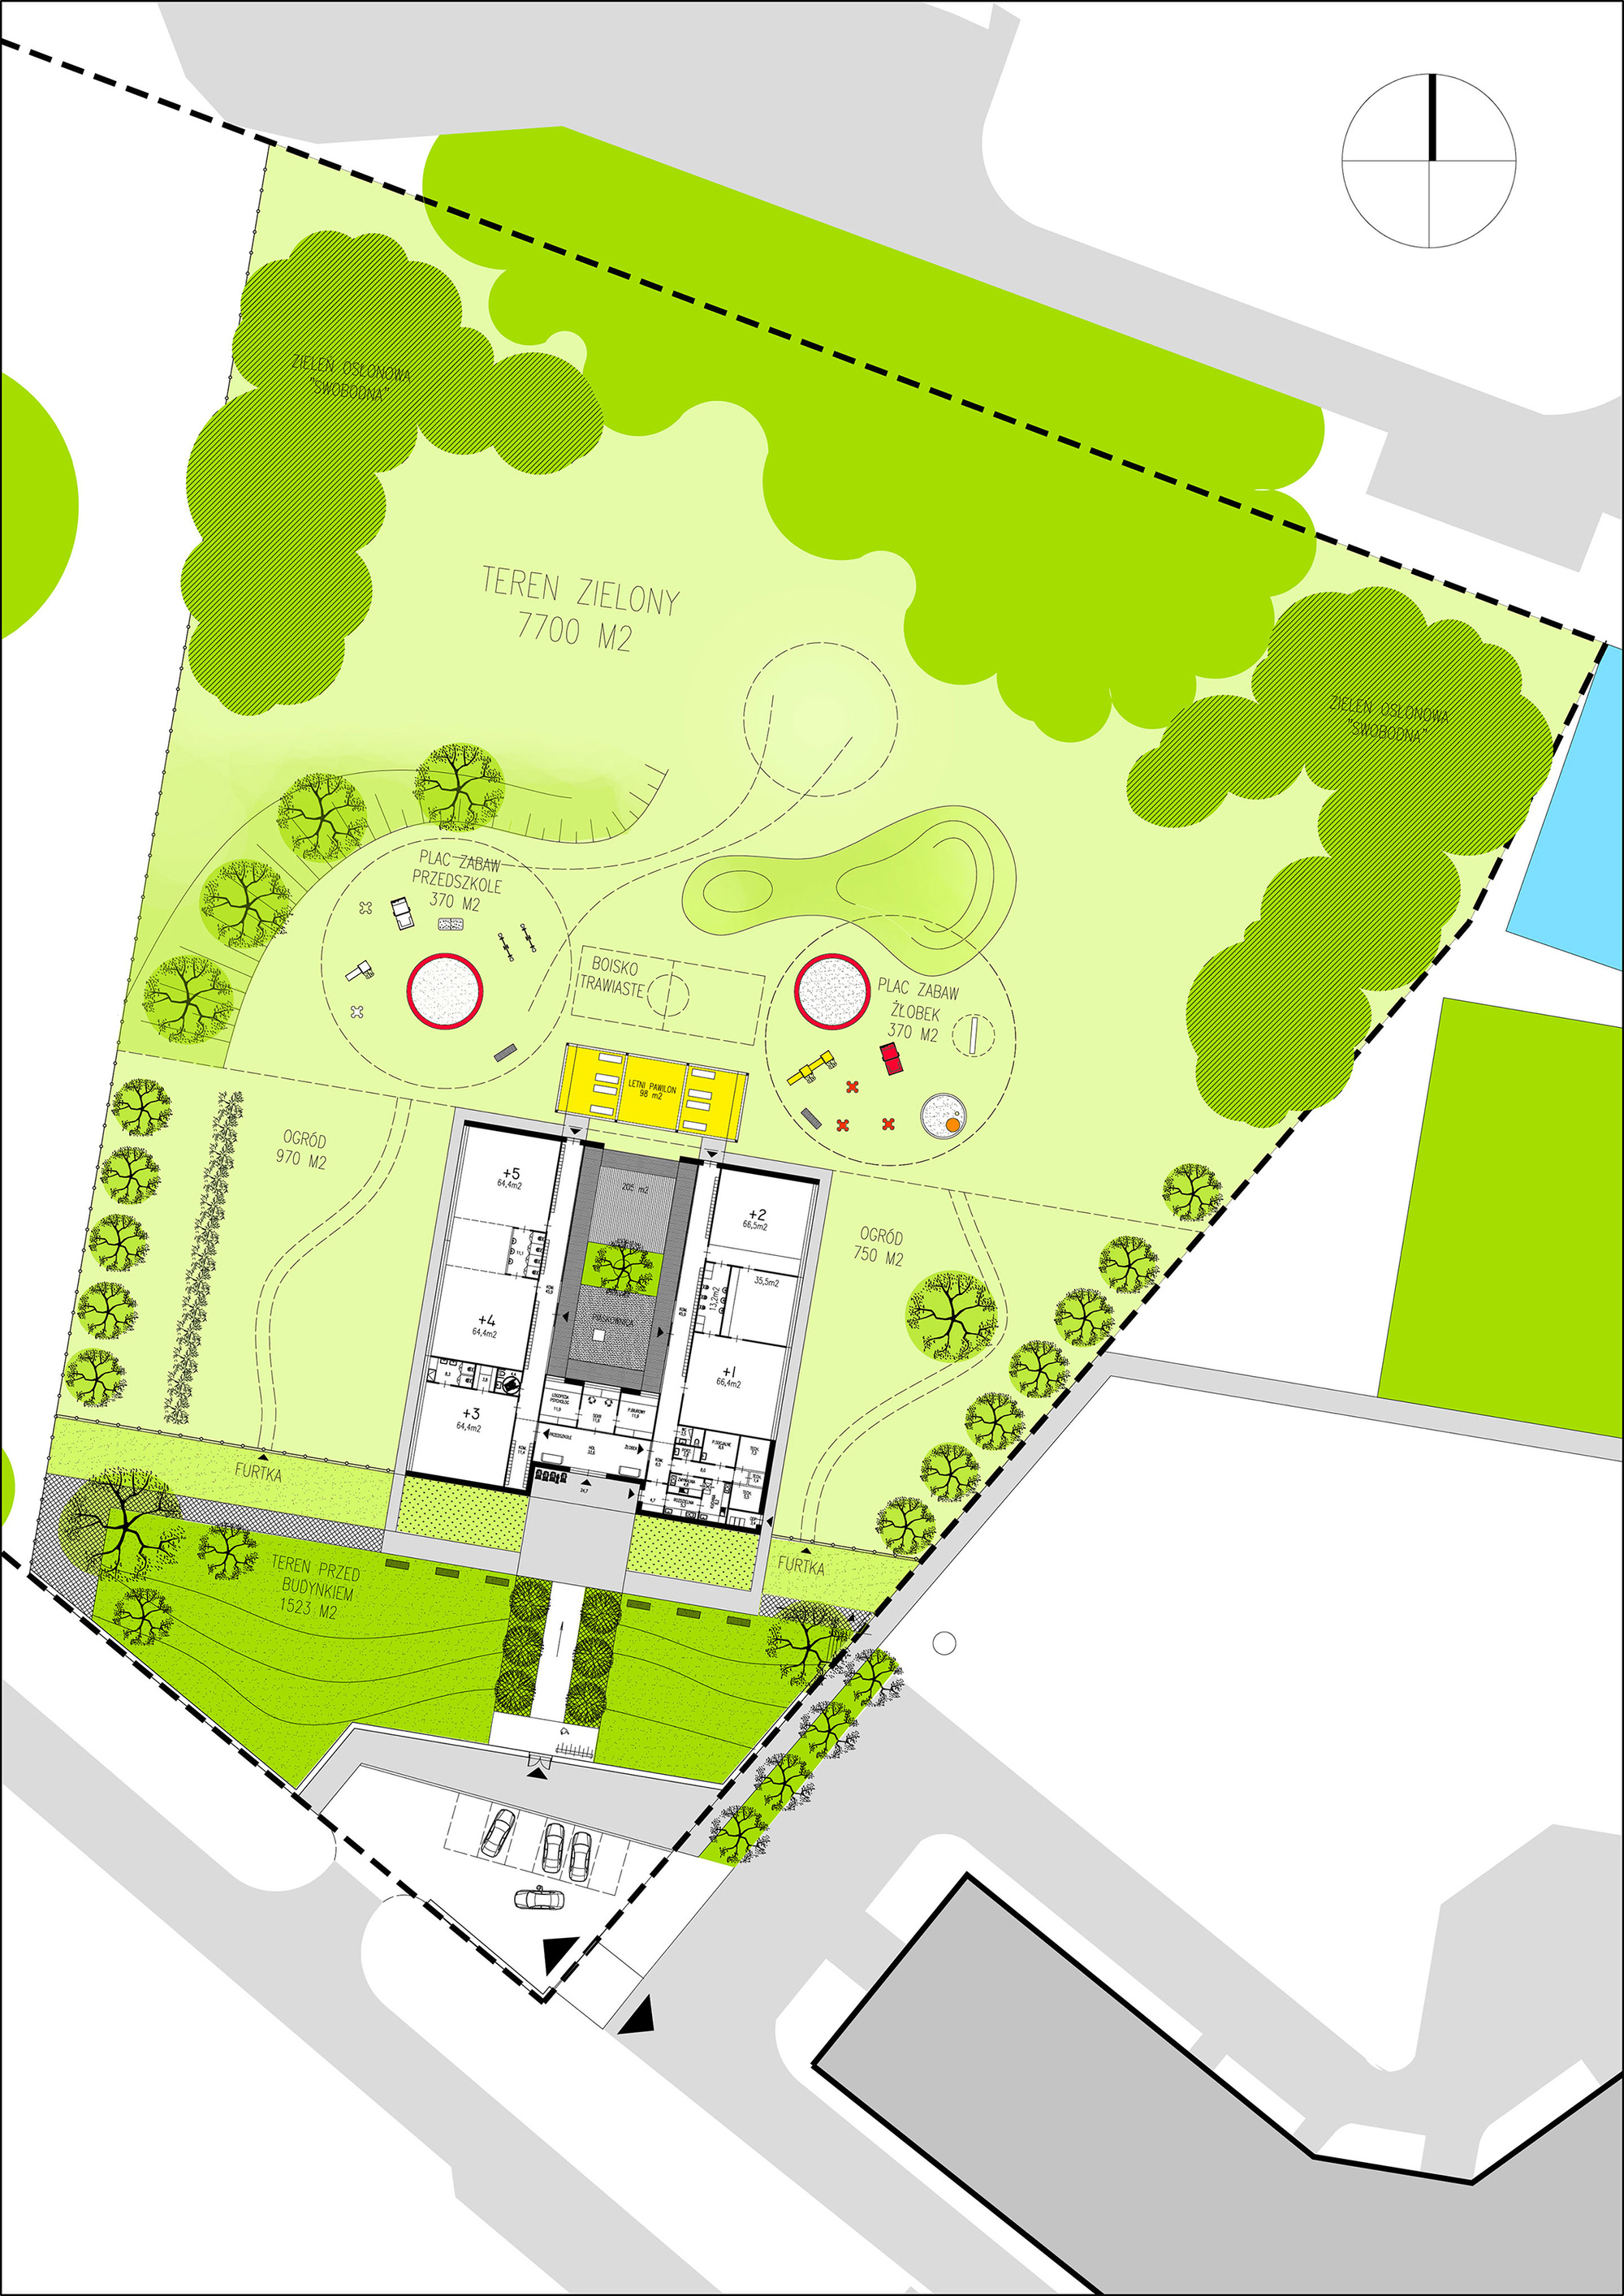 Gallery of yellow elephant kindergarten xystudio 25 for Plantas de colegios arquitectura